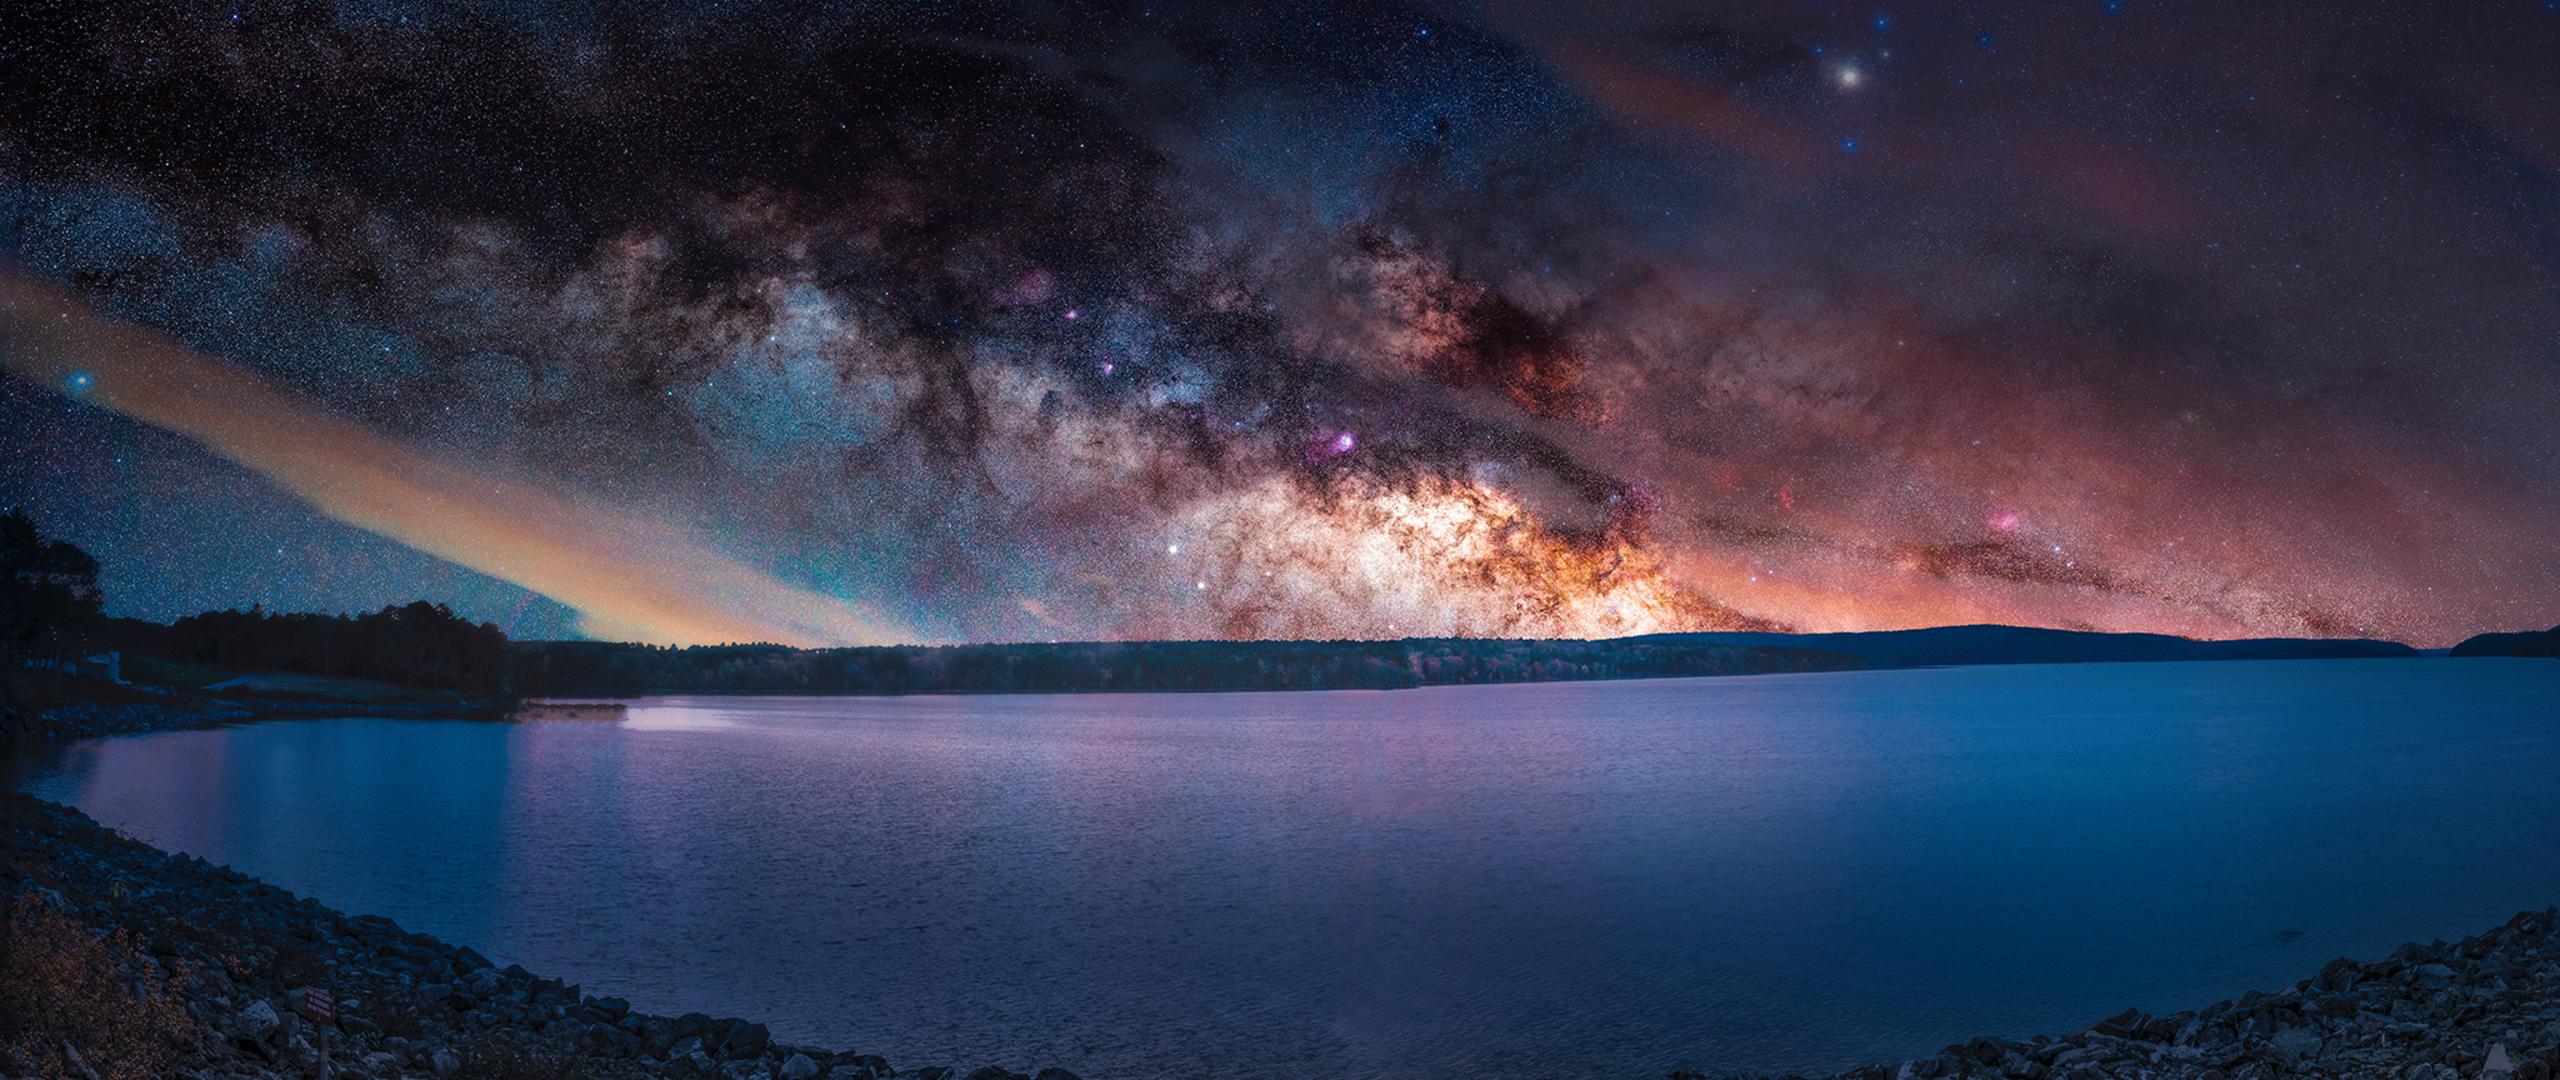 colorful-sky-stars-landscape-sea-2e.jpg